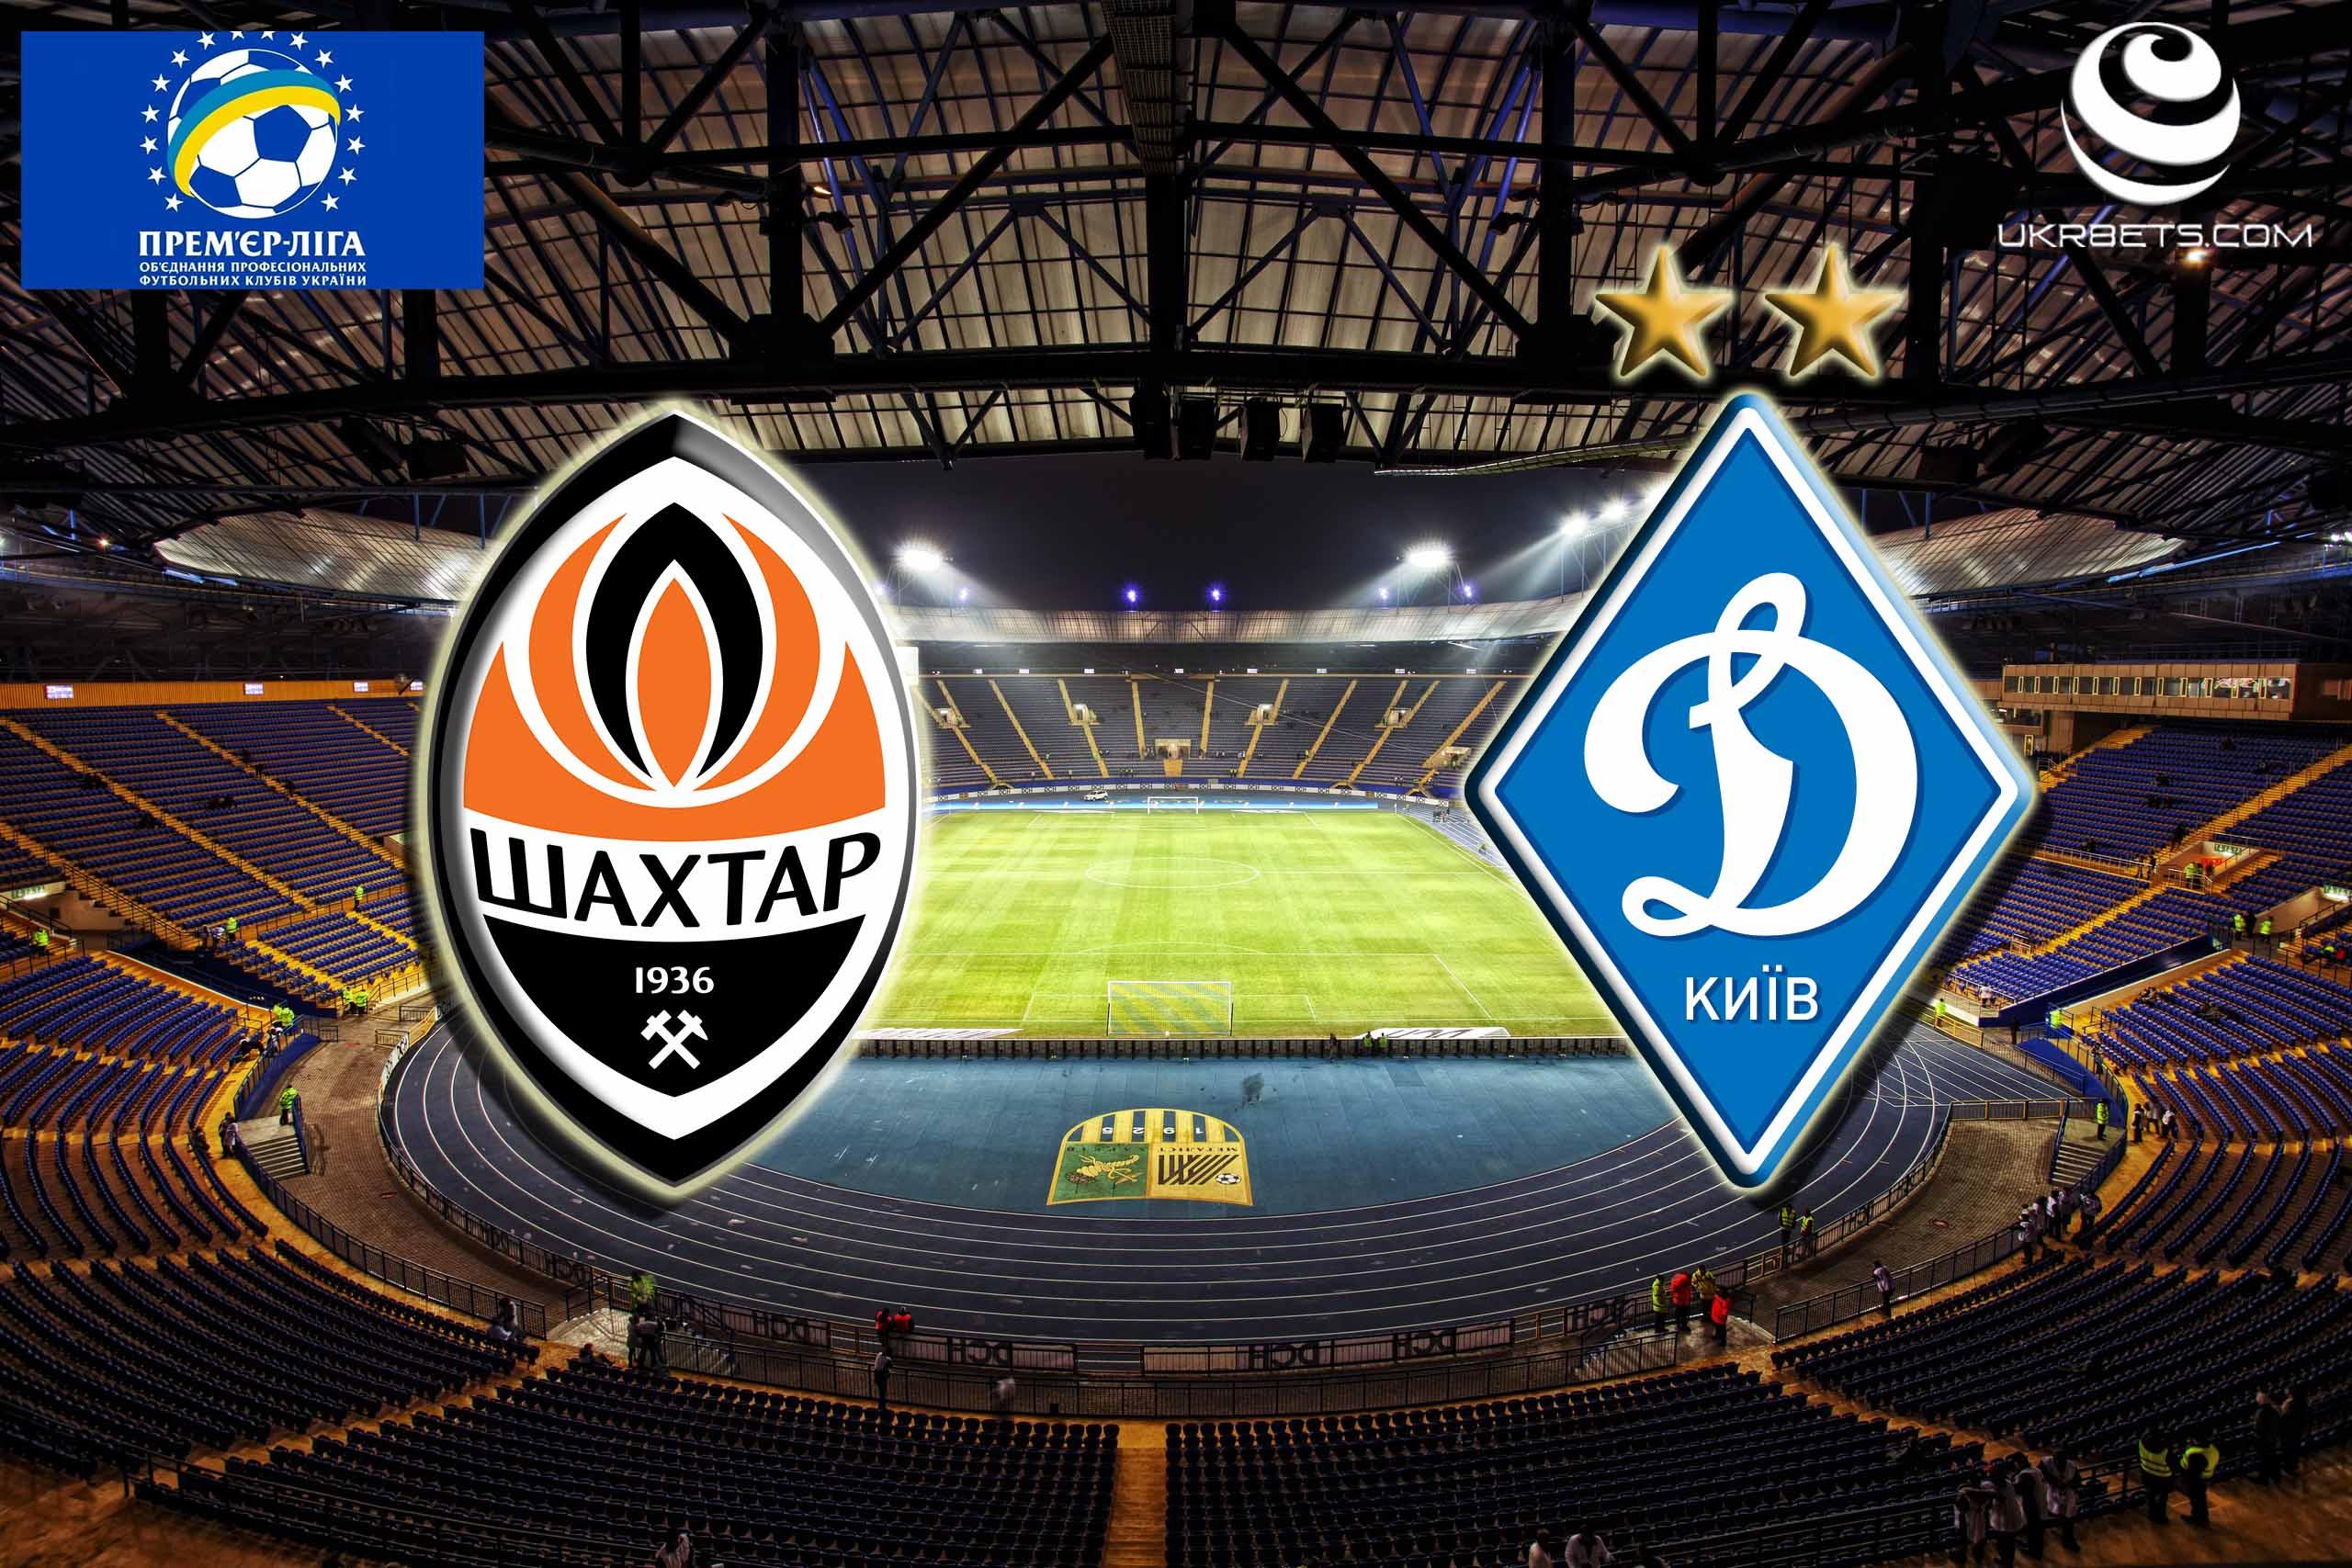 Прогноз на матч Шахтер Донецк - Динамо Киев 9 сентября 2016